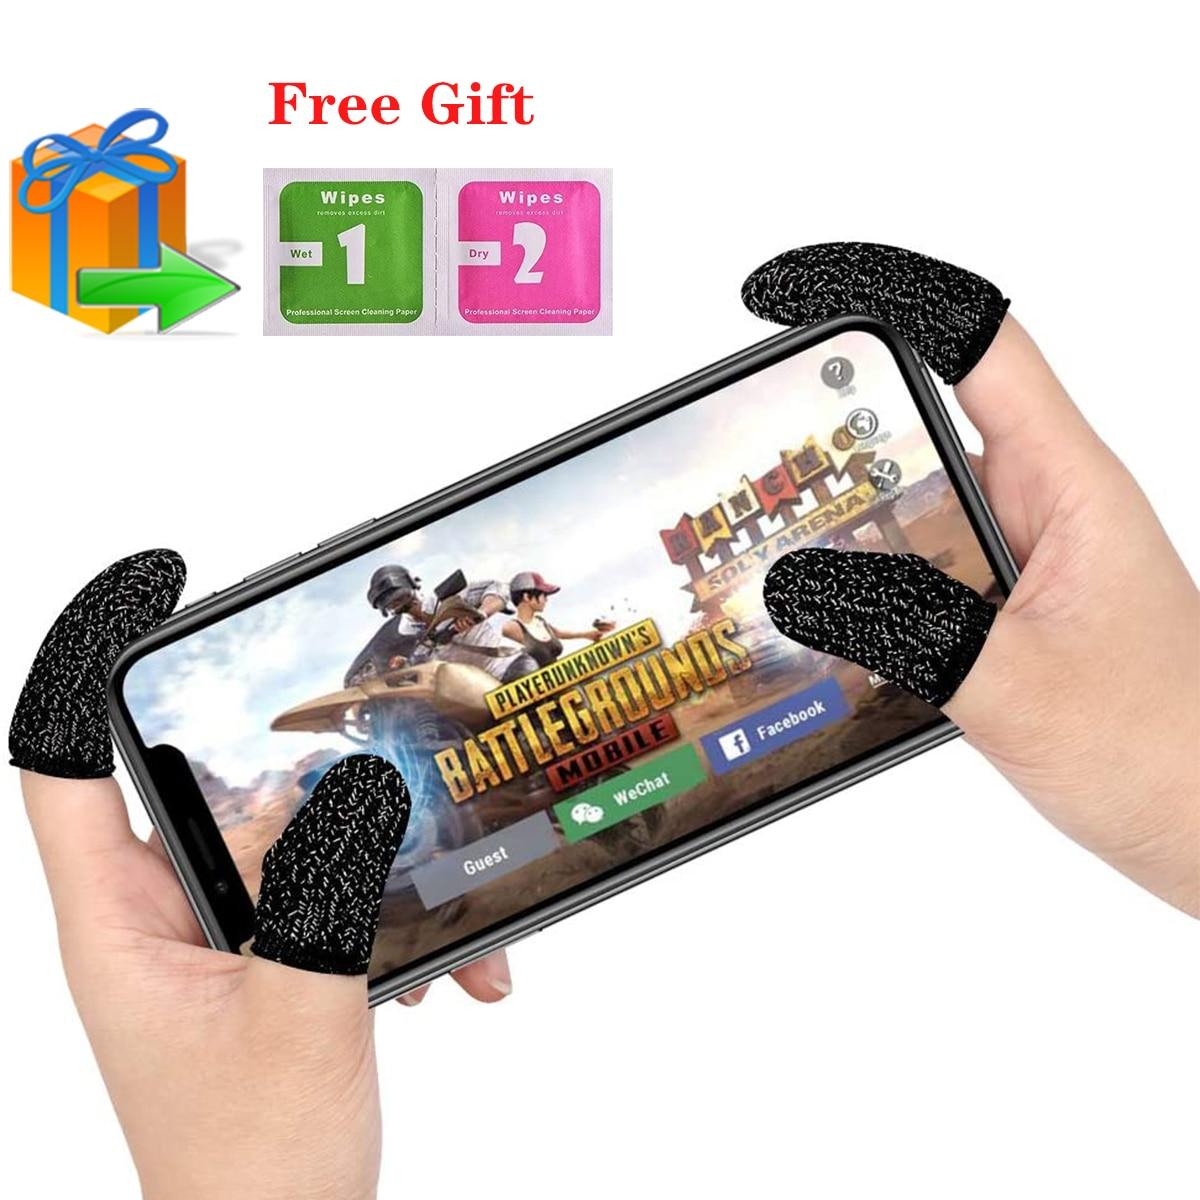 6pcs Game Finger Gloves For Touchscreen Thumb Finger Sleeve For Sensitive Shoot Aim Sweat Proof Finger Cots Gaming Gloves